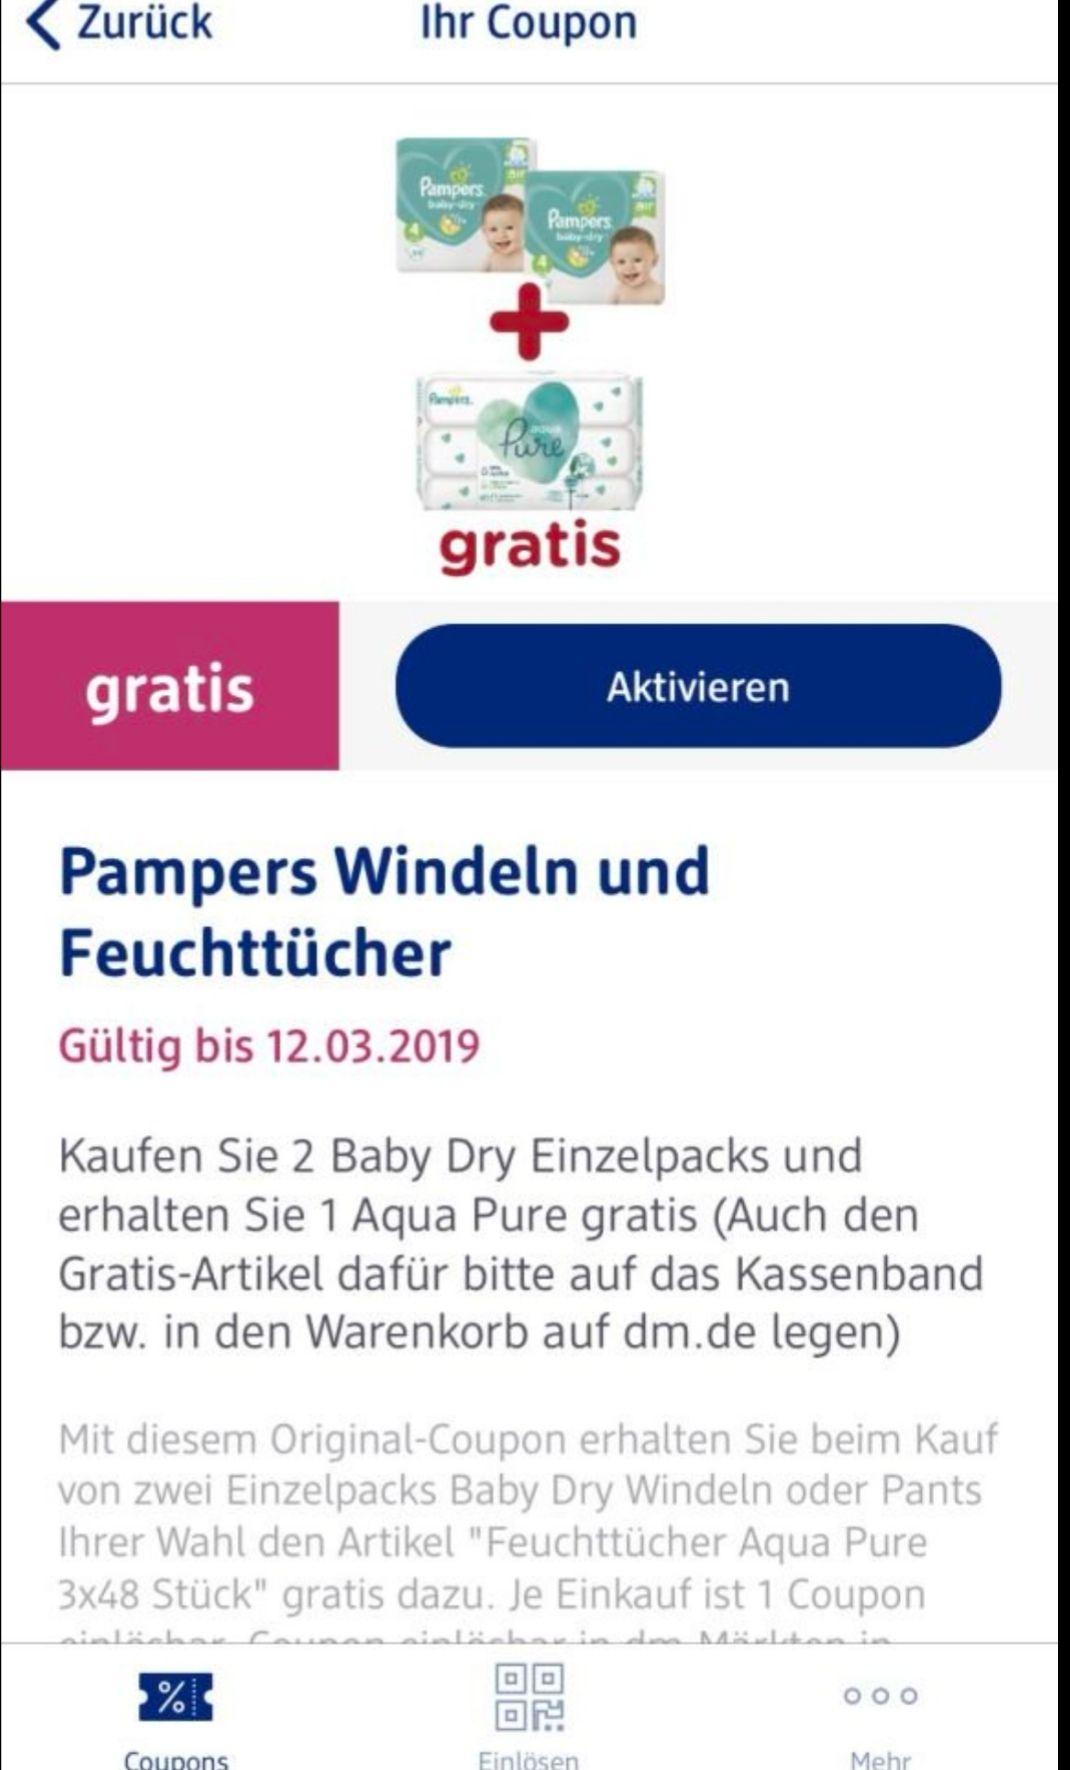 [dm Glückskind - App] - 2 Pkt. Pampers Baby Dry + 144 Feuchttücher Aqua Pure